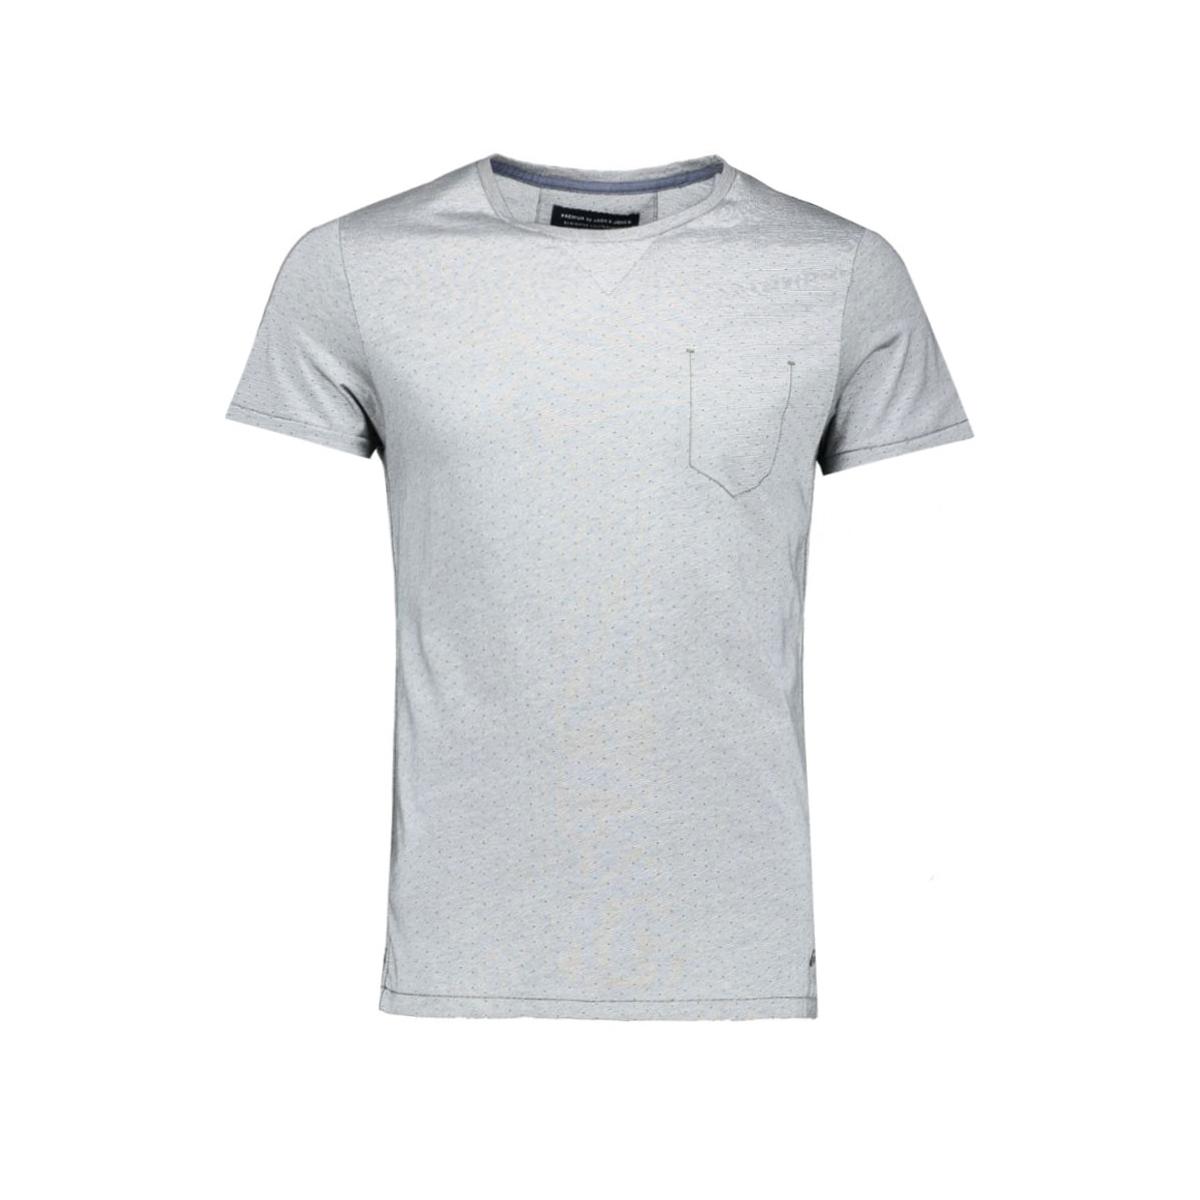 jjprjack tee ss crew neck 12105309 jack & jones t-shirt urban chic